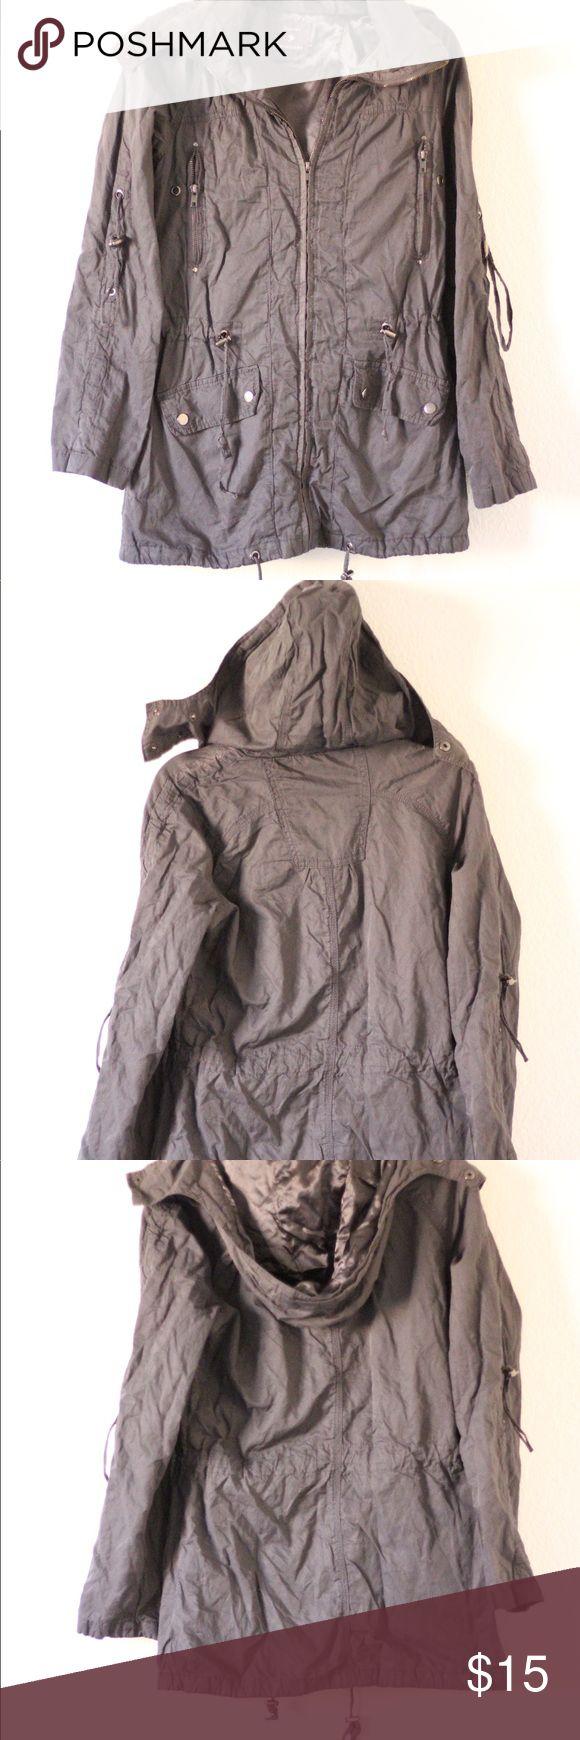 Gray women's Utility Jacket Gray women's Utility Jacket from Forever 21 Forever 21 Jackets & Coats Utility Jackets